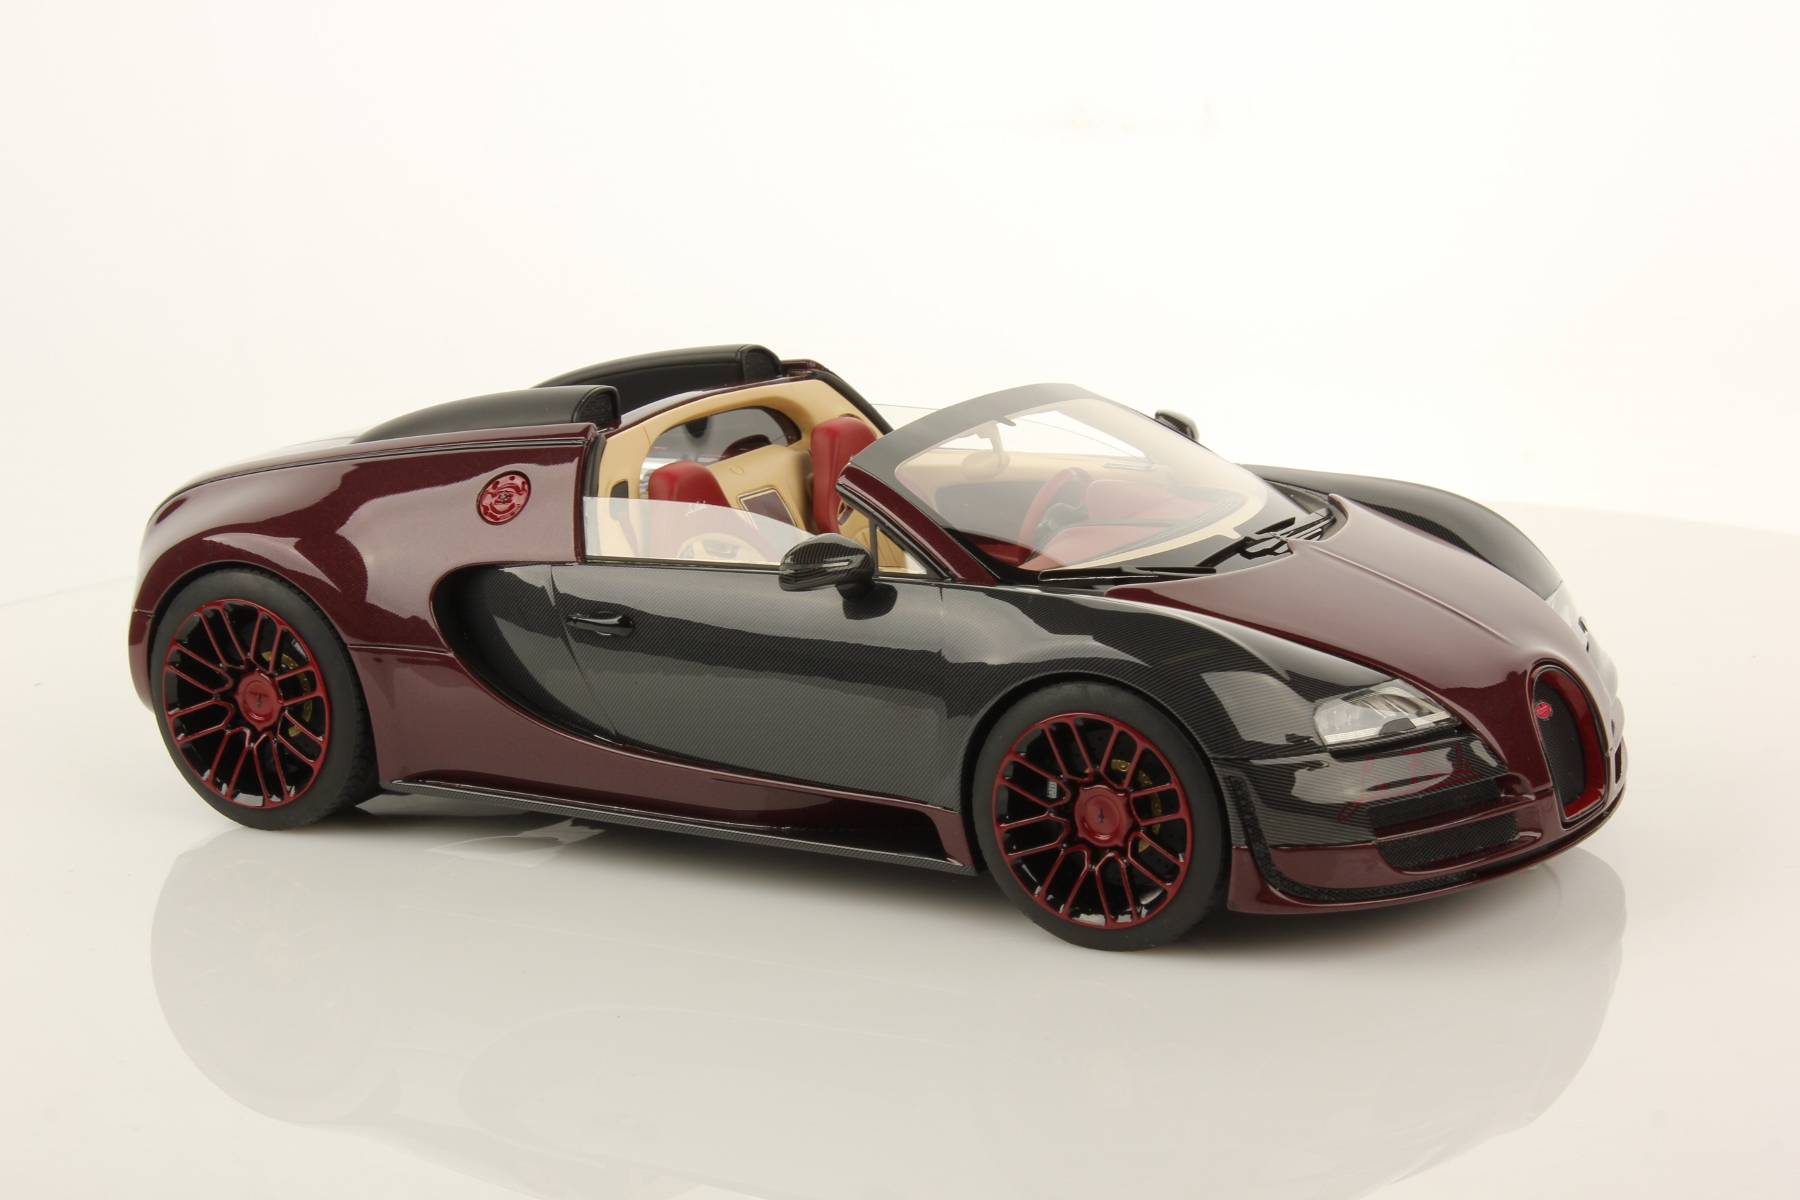 bugatti veyron 16 4 grand sport vitesse la finale 1 18 mr collection models. Black Bedroom Furniture Sets. Home Design Ideas